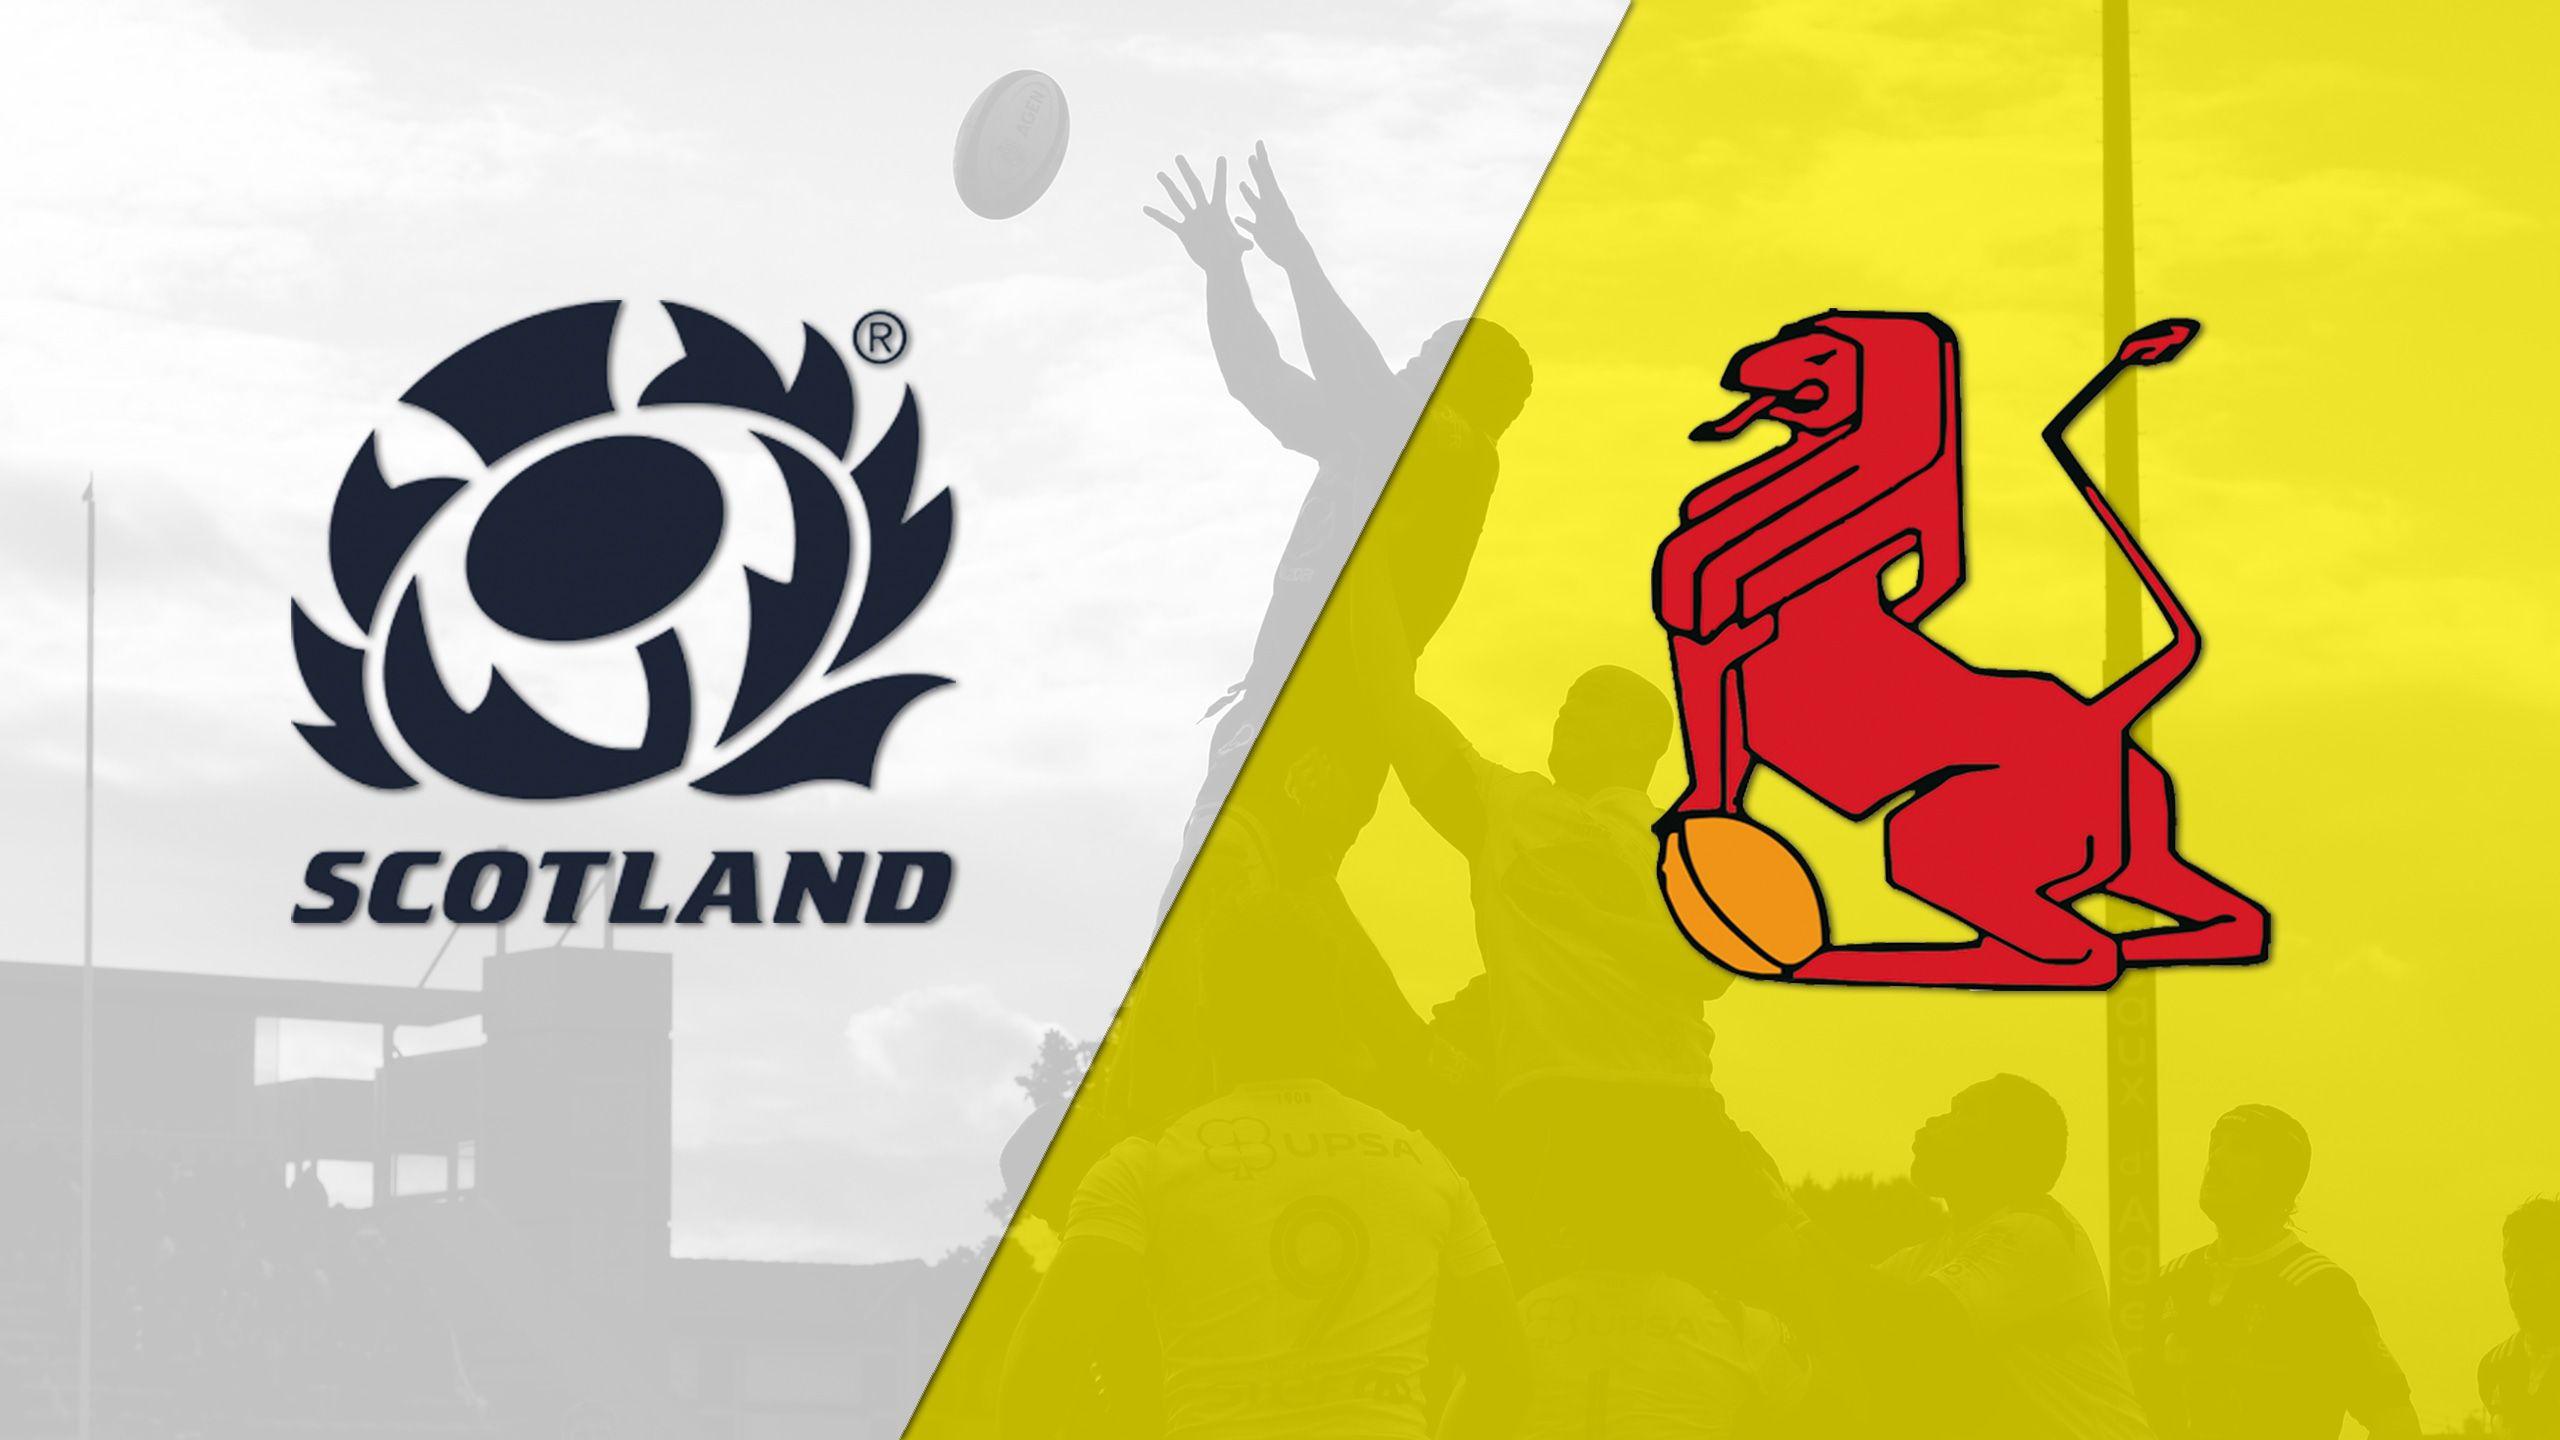 Scotland vs. Spain (World Rugby Sevens Series)